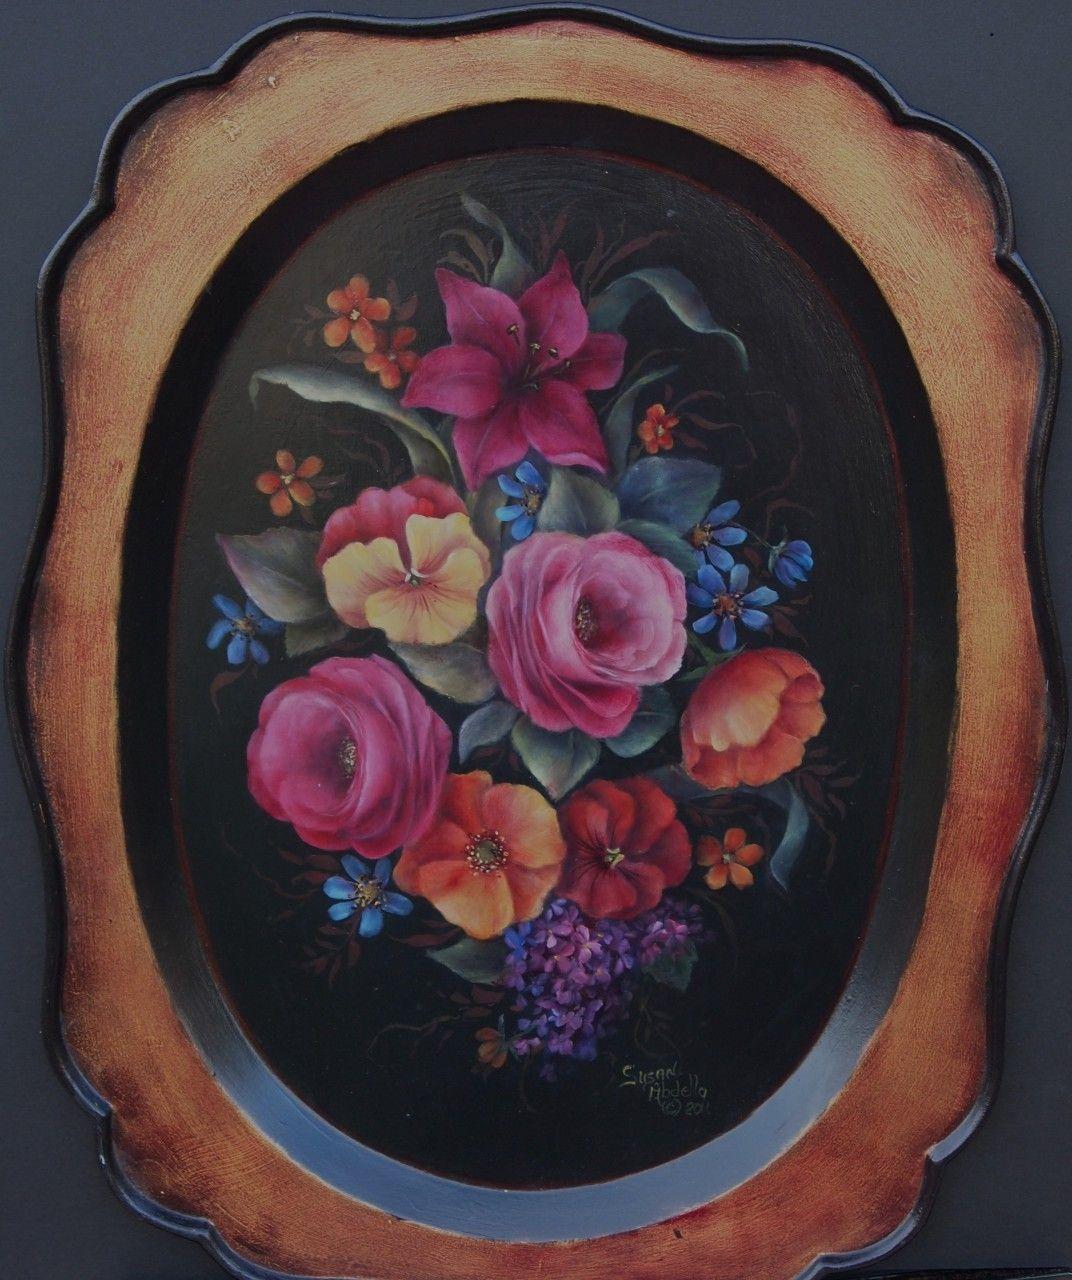 Art Apprentice Online - Acrylic DVD - Flowers From My Garden - Susan Abdella MDA, $24.95 (http://store.artapprenticeonline.com/acrylic-dvd-flowers-from-my-garden-susan-abdella-mda/)